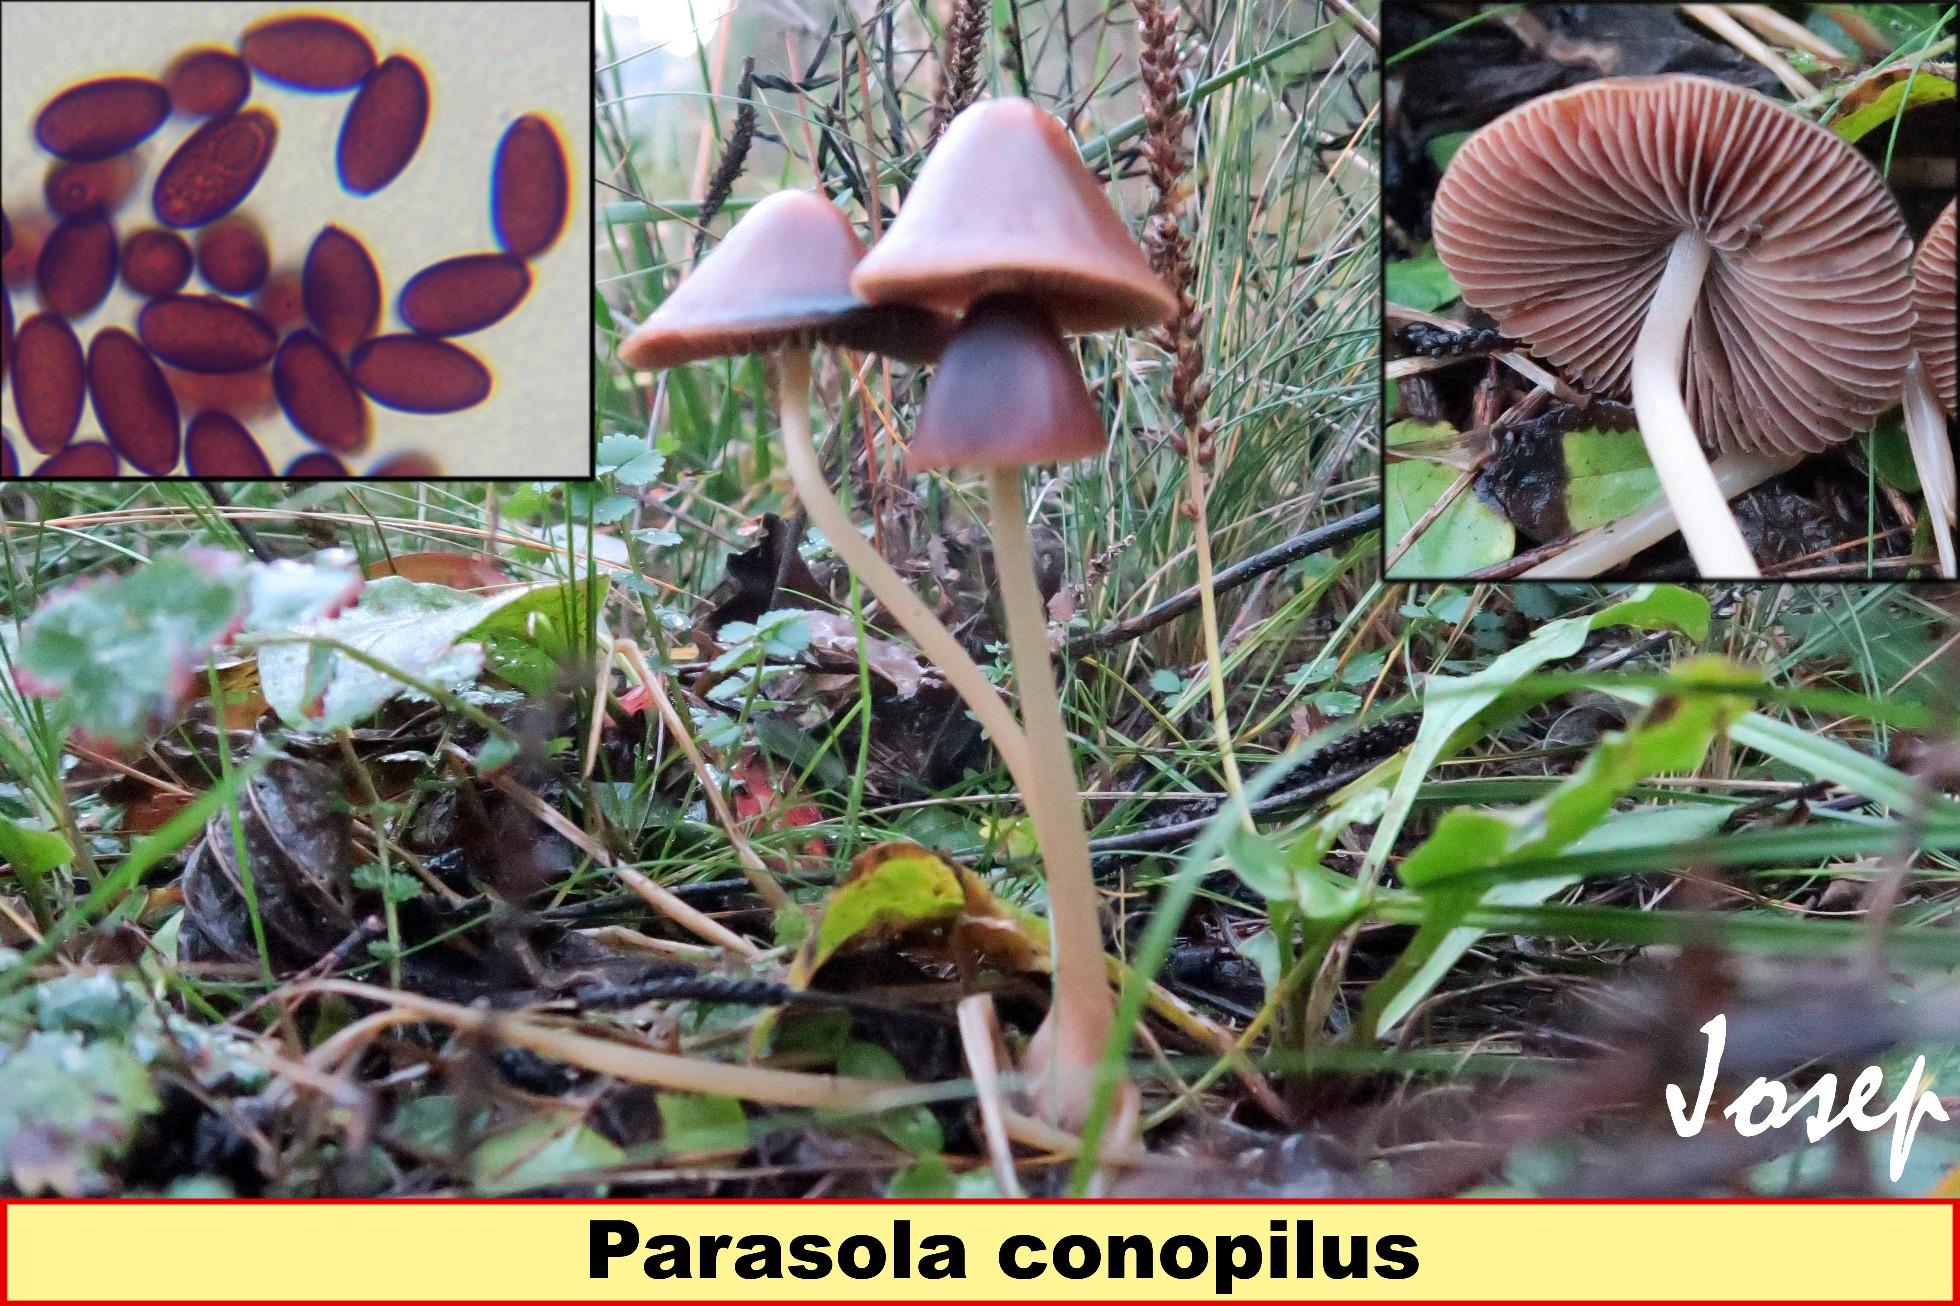 Parasolaconopilus_2017-04-07.jpg